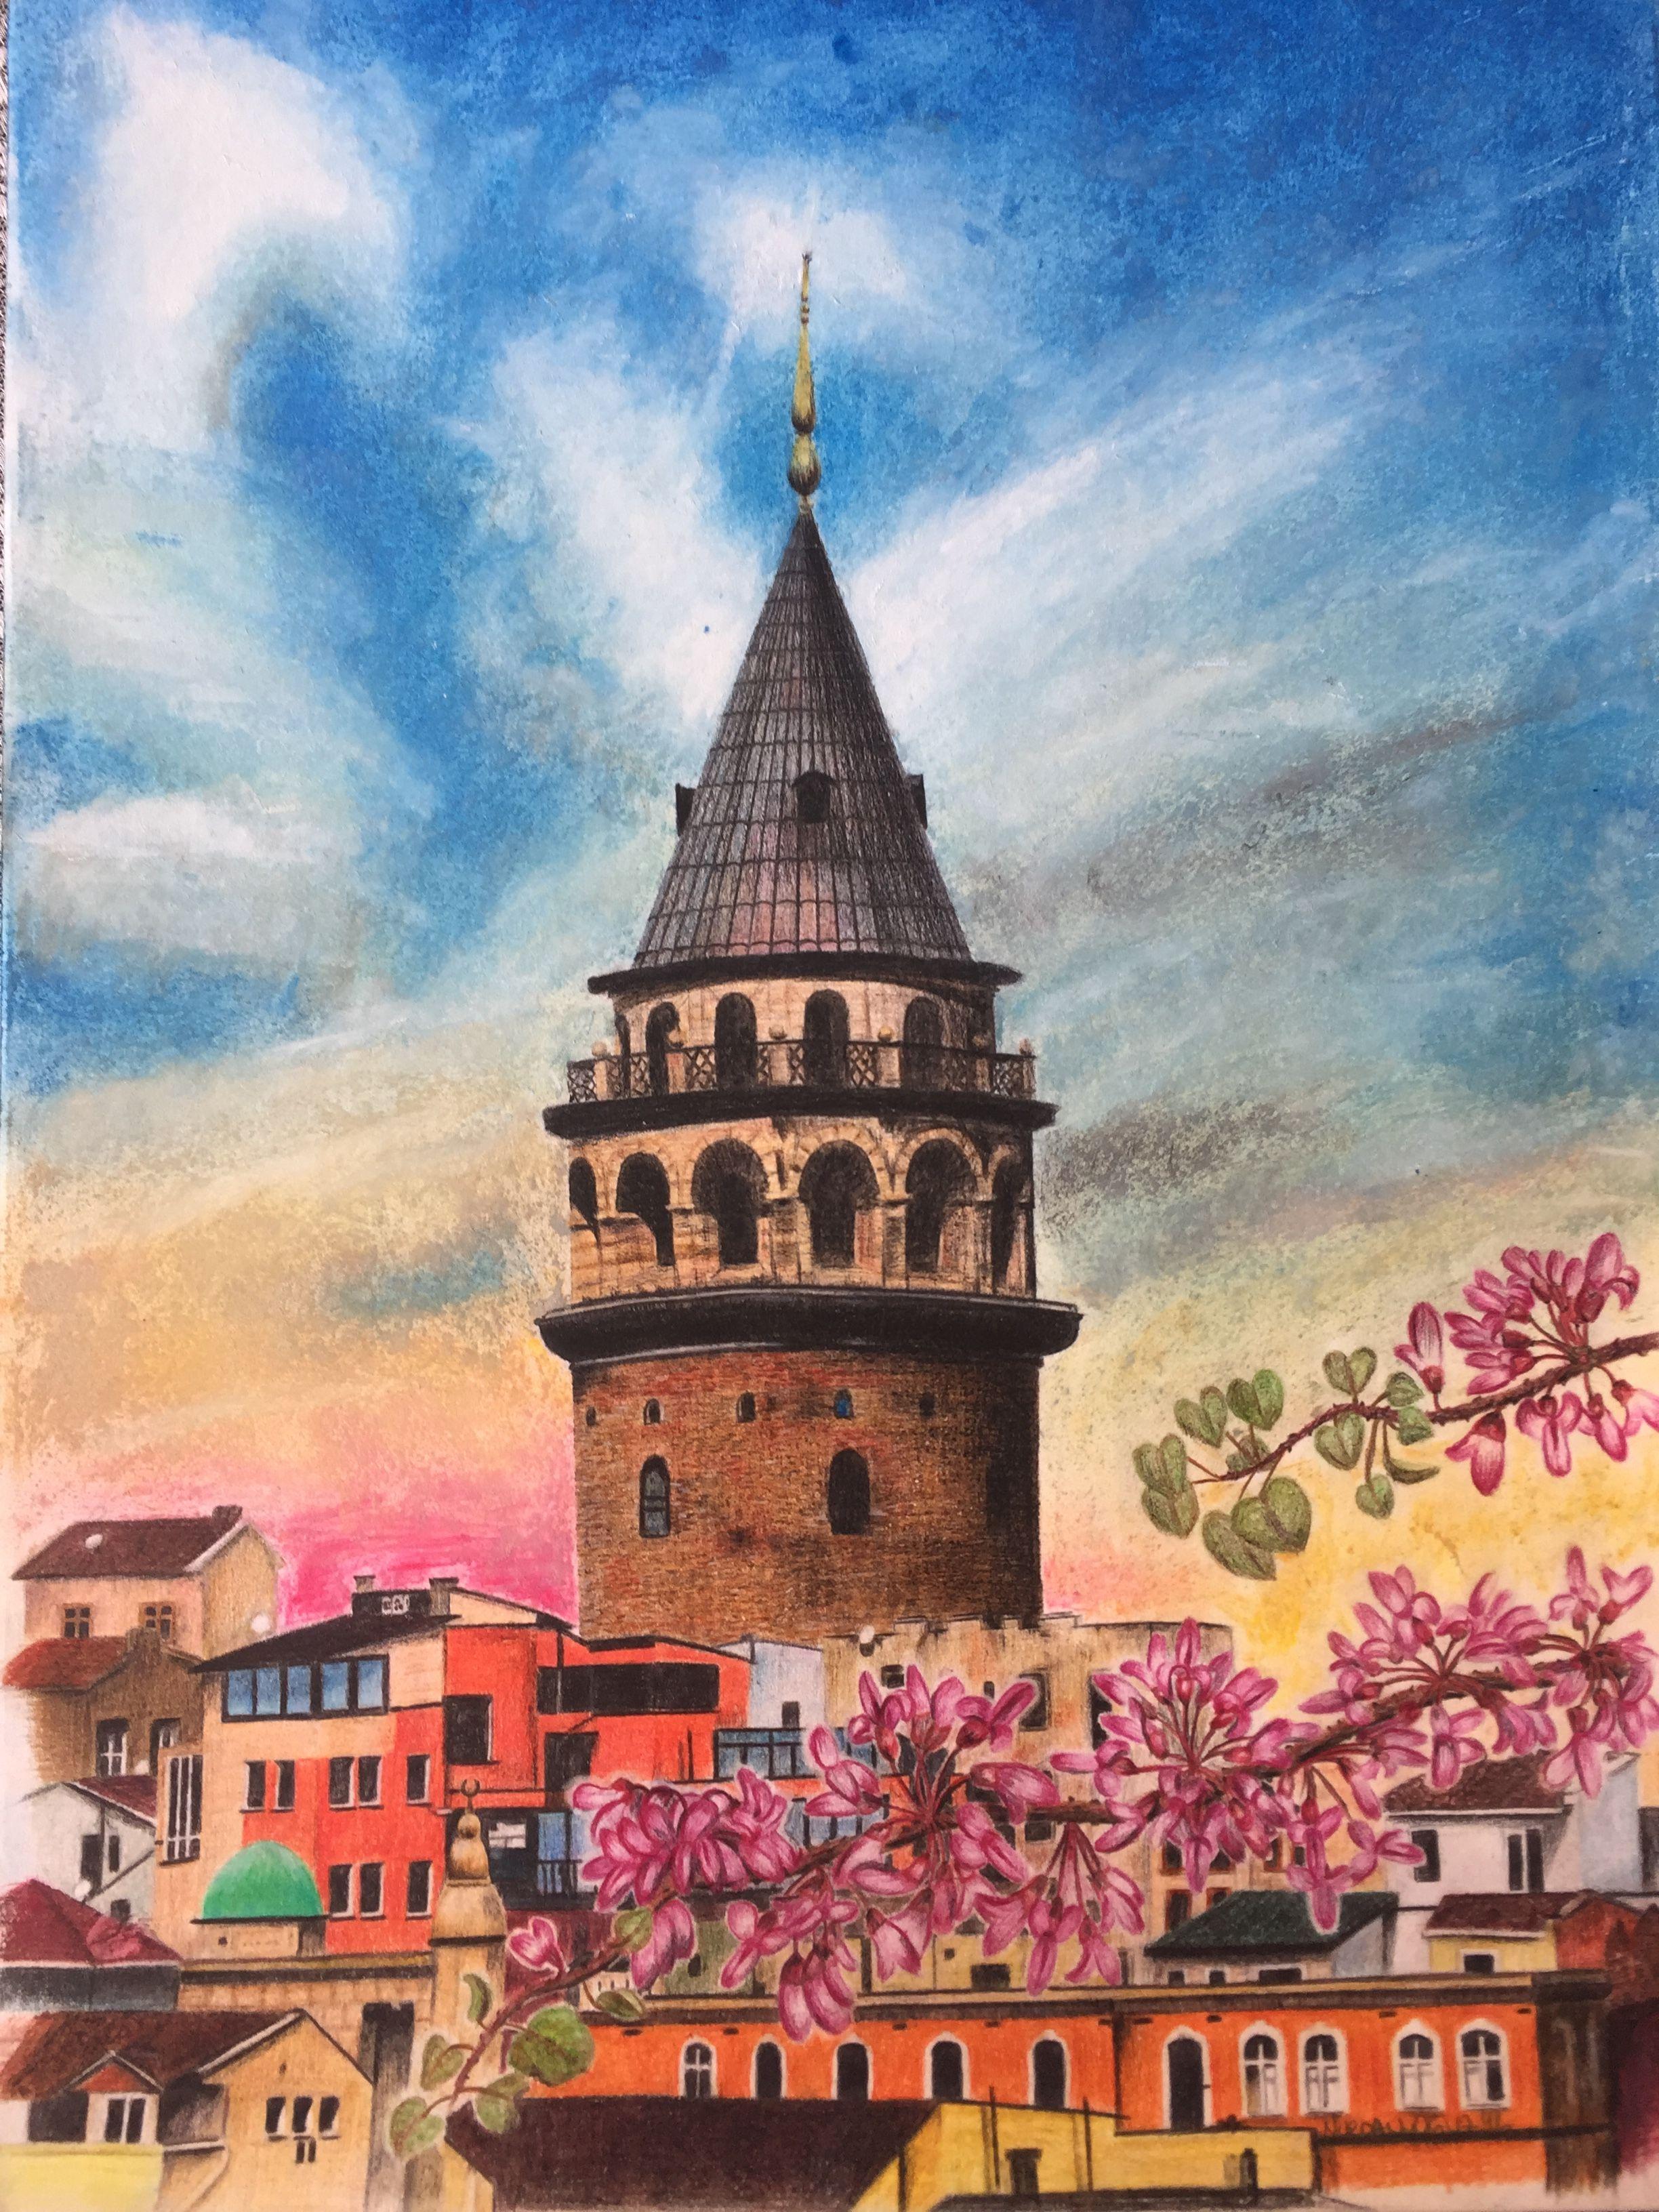 Kuru Kalem Galata Kulesi Calismam Resimler Resim Sanati Kaleler